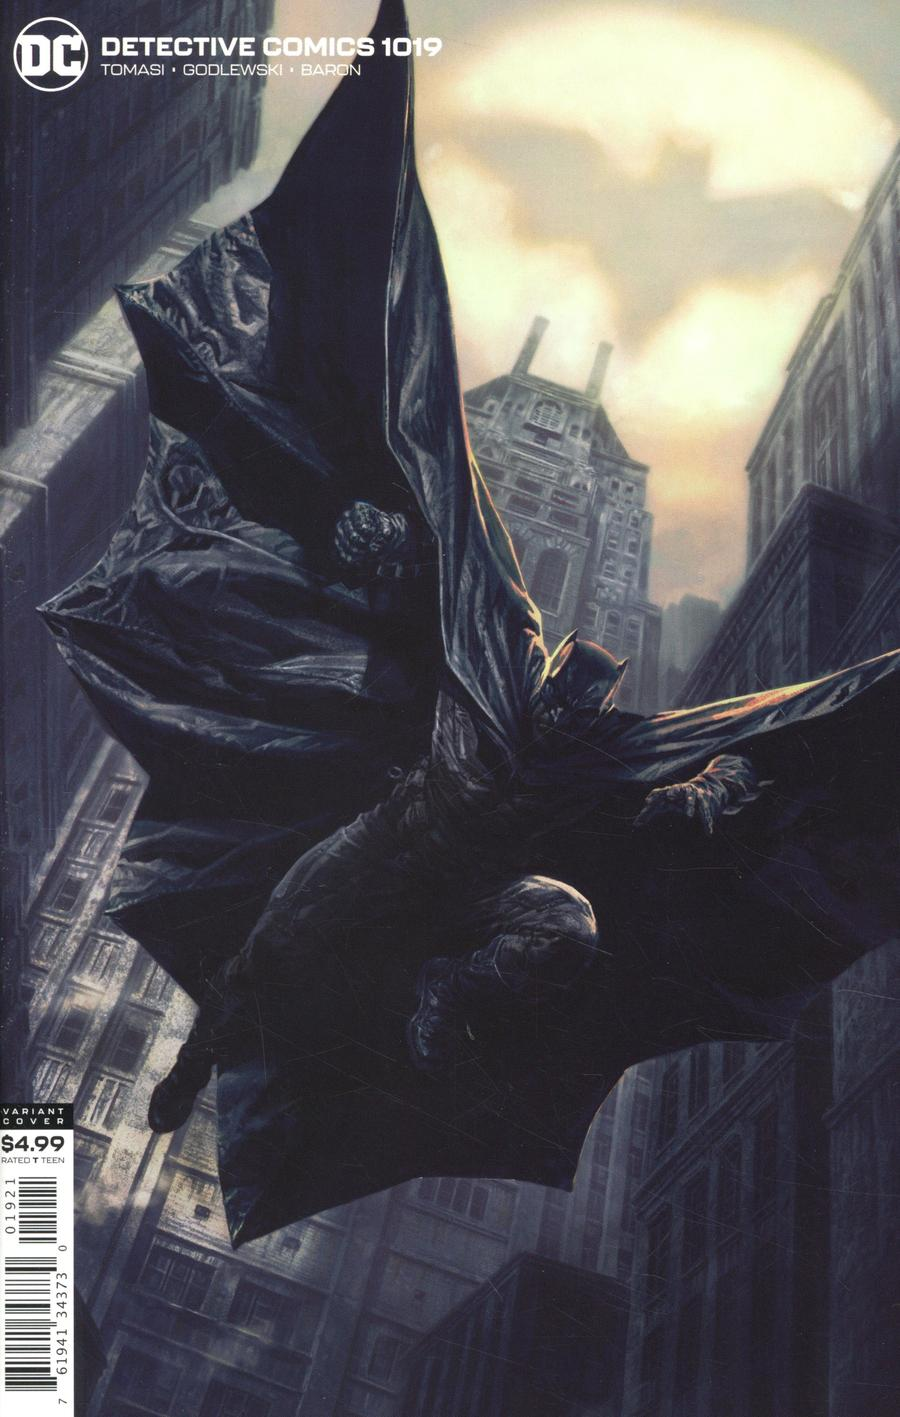 Detective Comics Vol 2 #1019 Cover B Variant Lee Bermejo Card Stock Cover